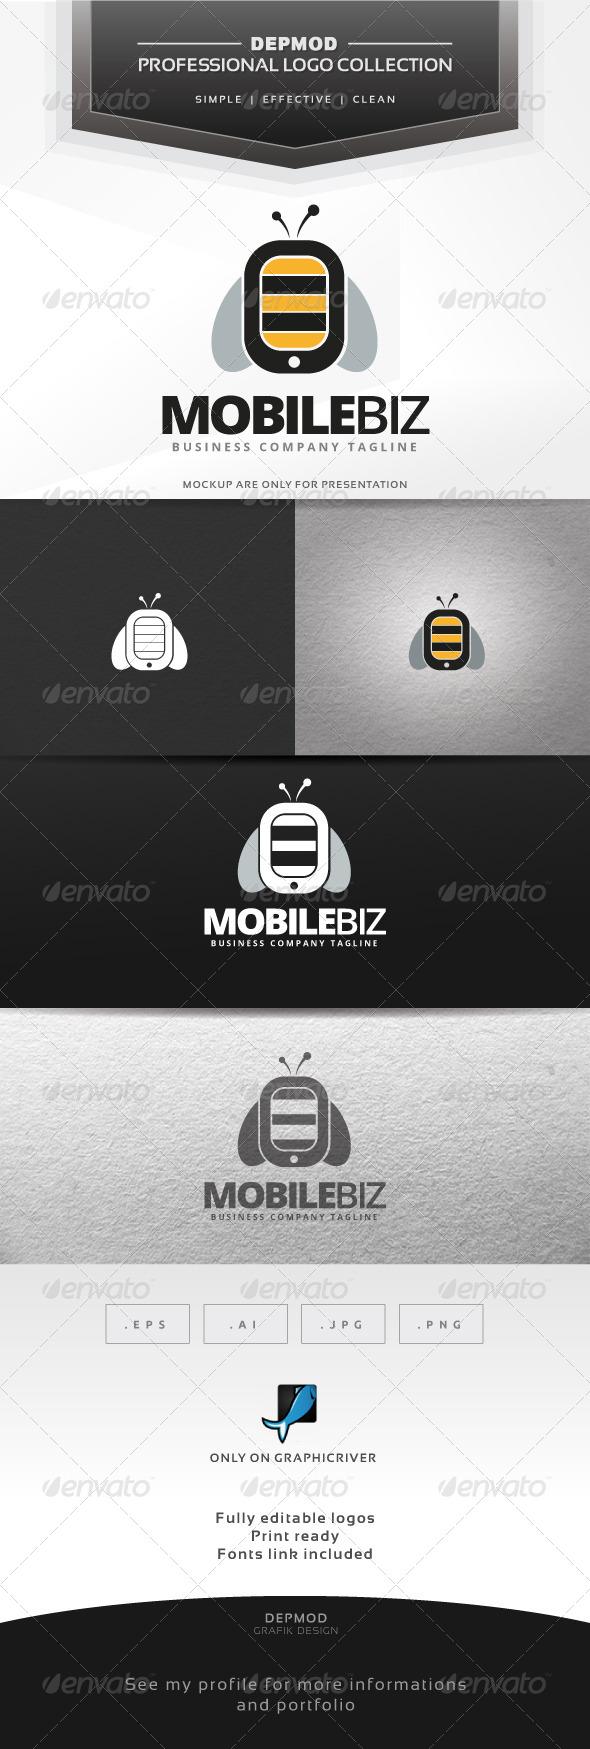 Mobile Biz Logo